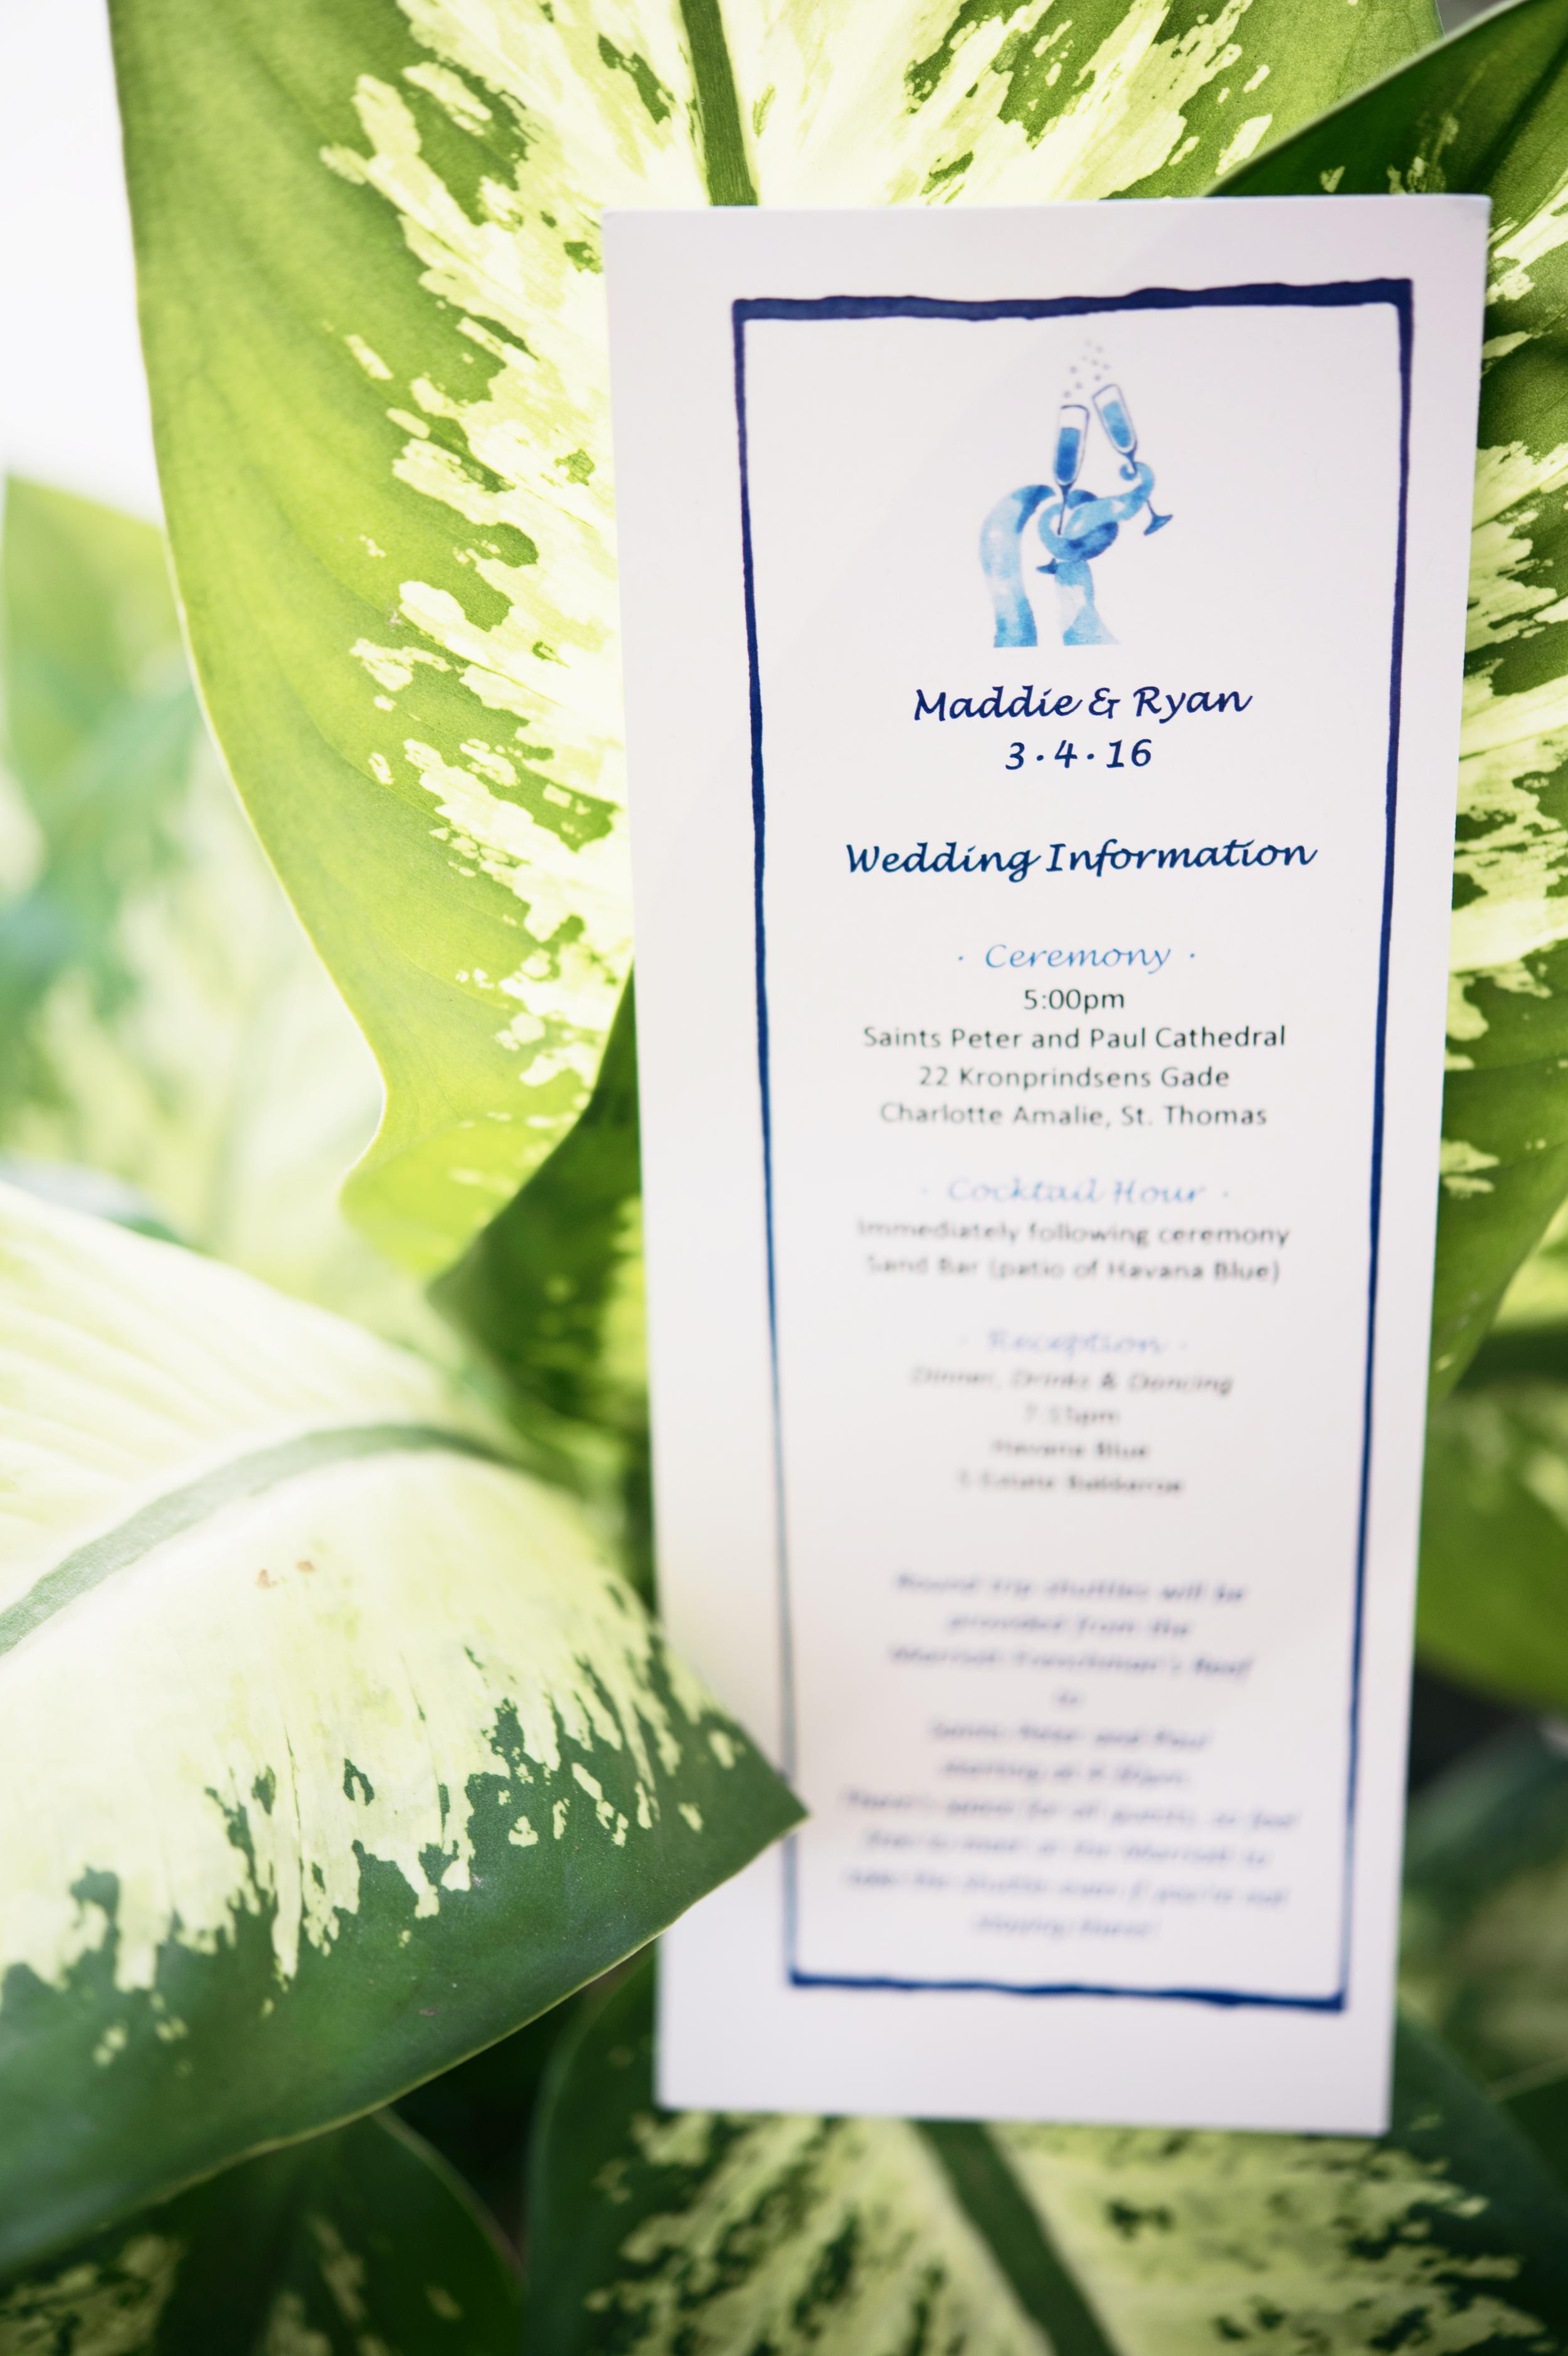 St Thomas US Virgin Islands Wedding